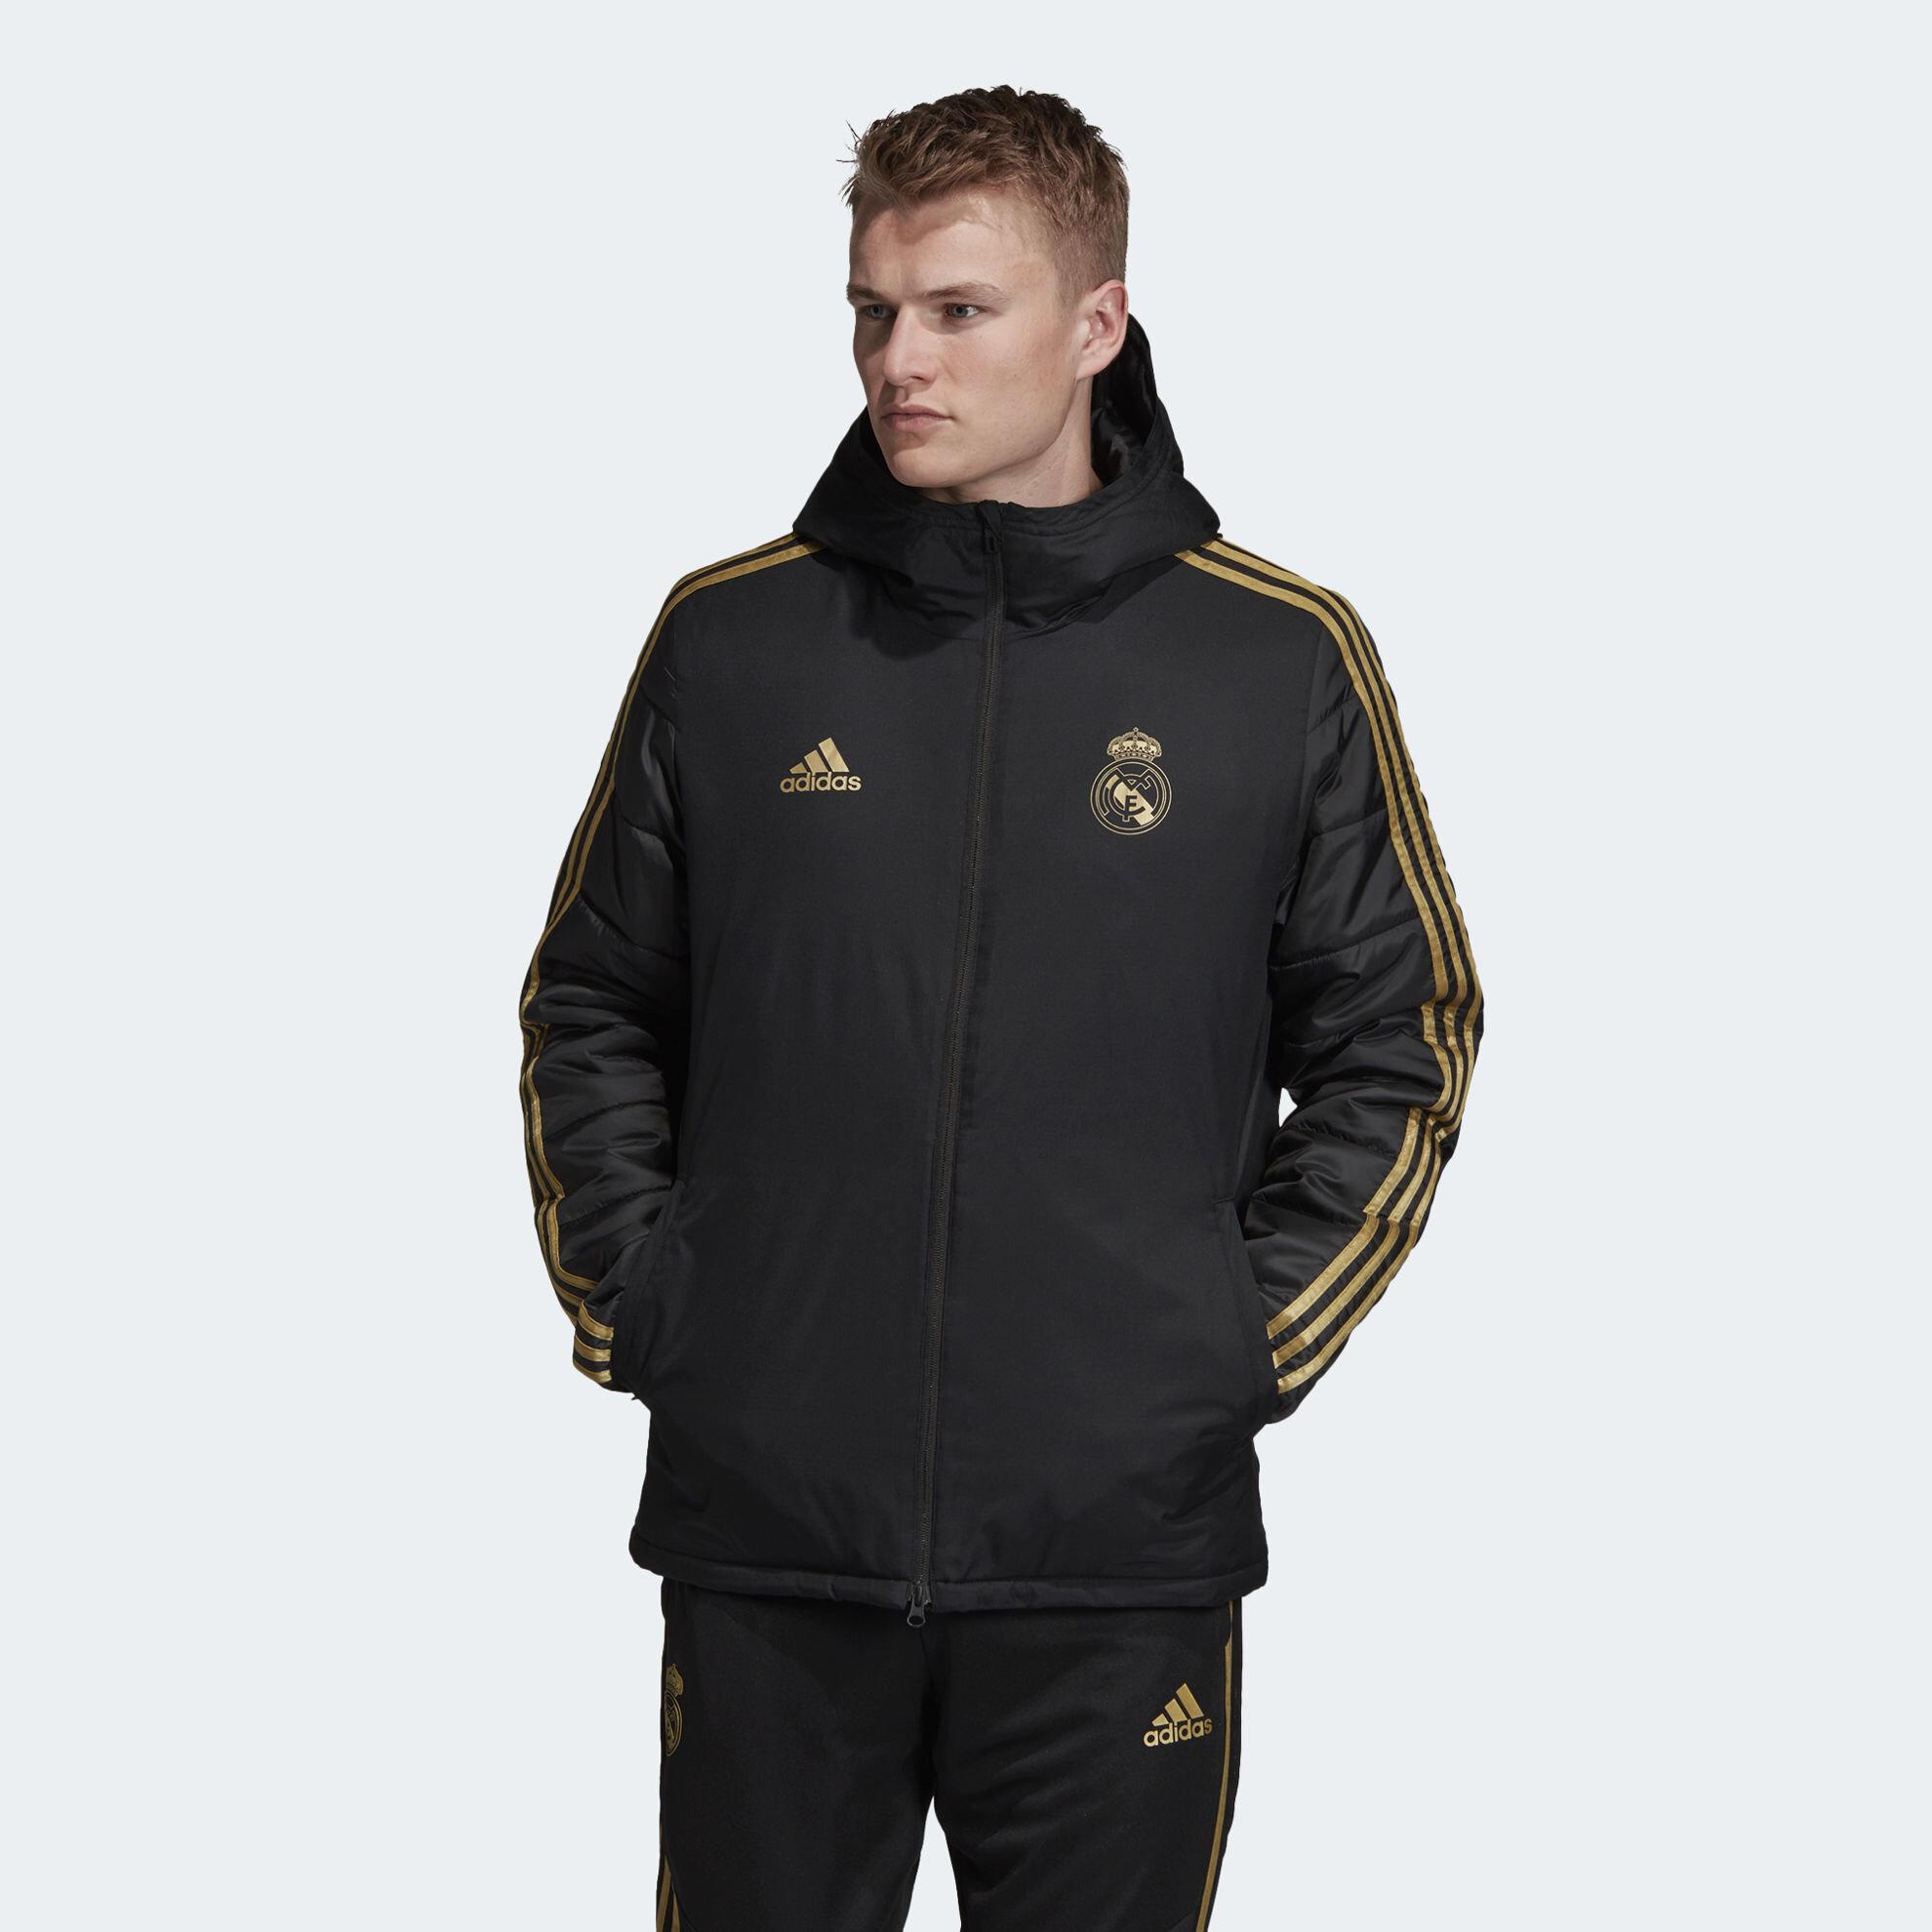 versus Inaccesible Vandalir  adidas Real Madrid Winter Jacket | Running shoes, sportswear at Adidas  official website | Adidas IL